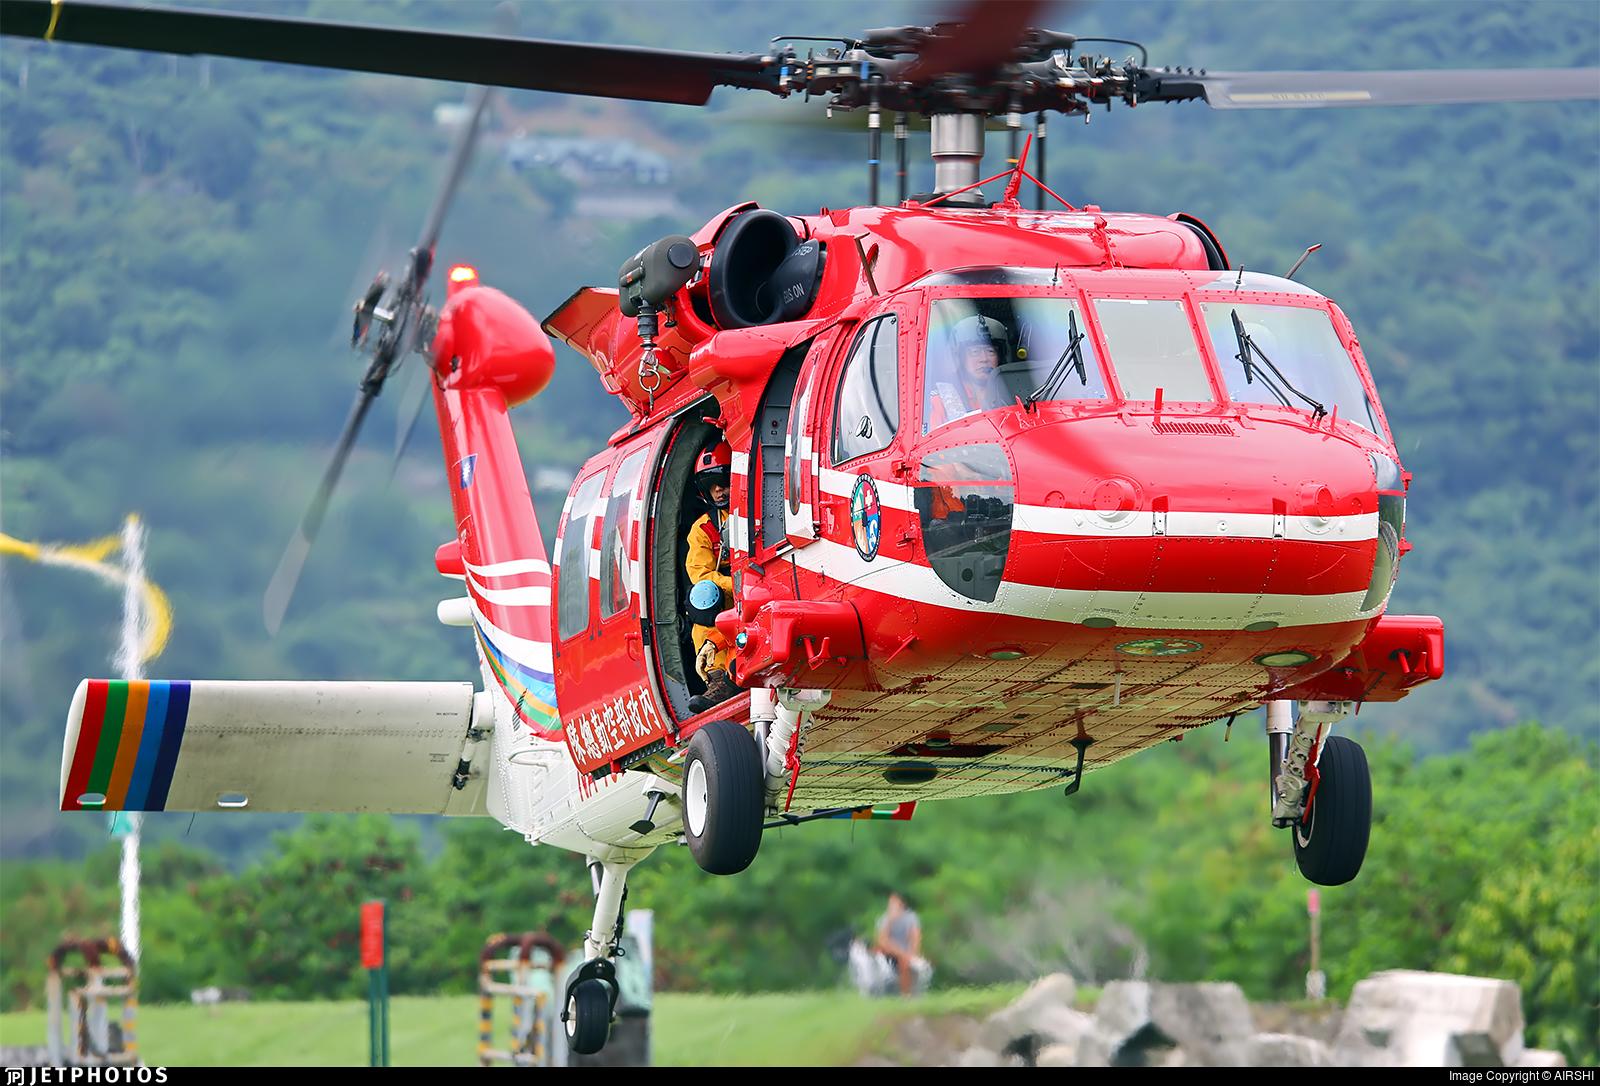 NA-701 - Sikorsky UH-60M Blackhawk - Taiwan - National Airborne Service Corps (NASC)